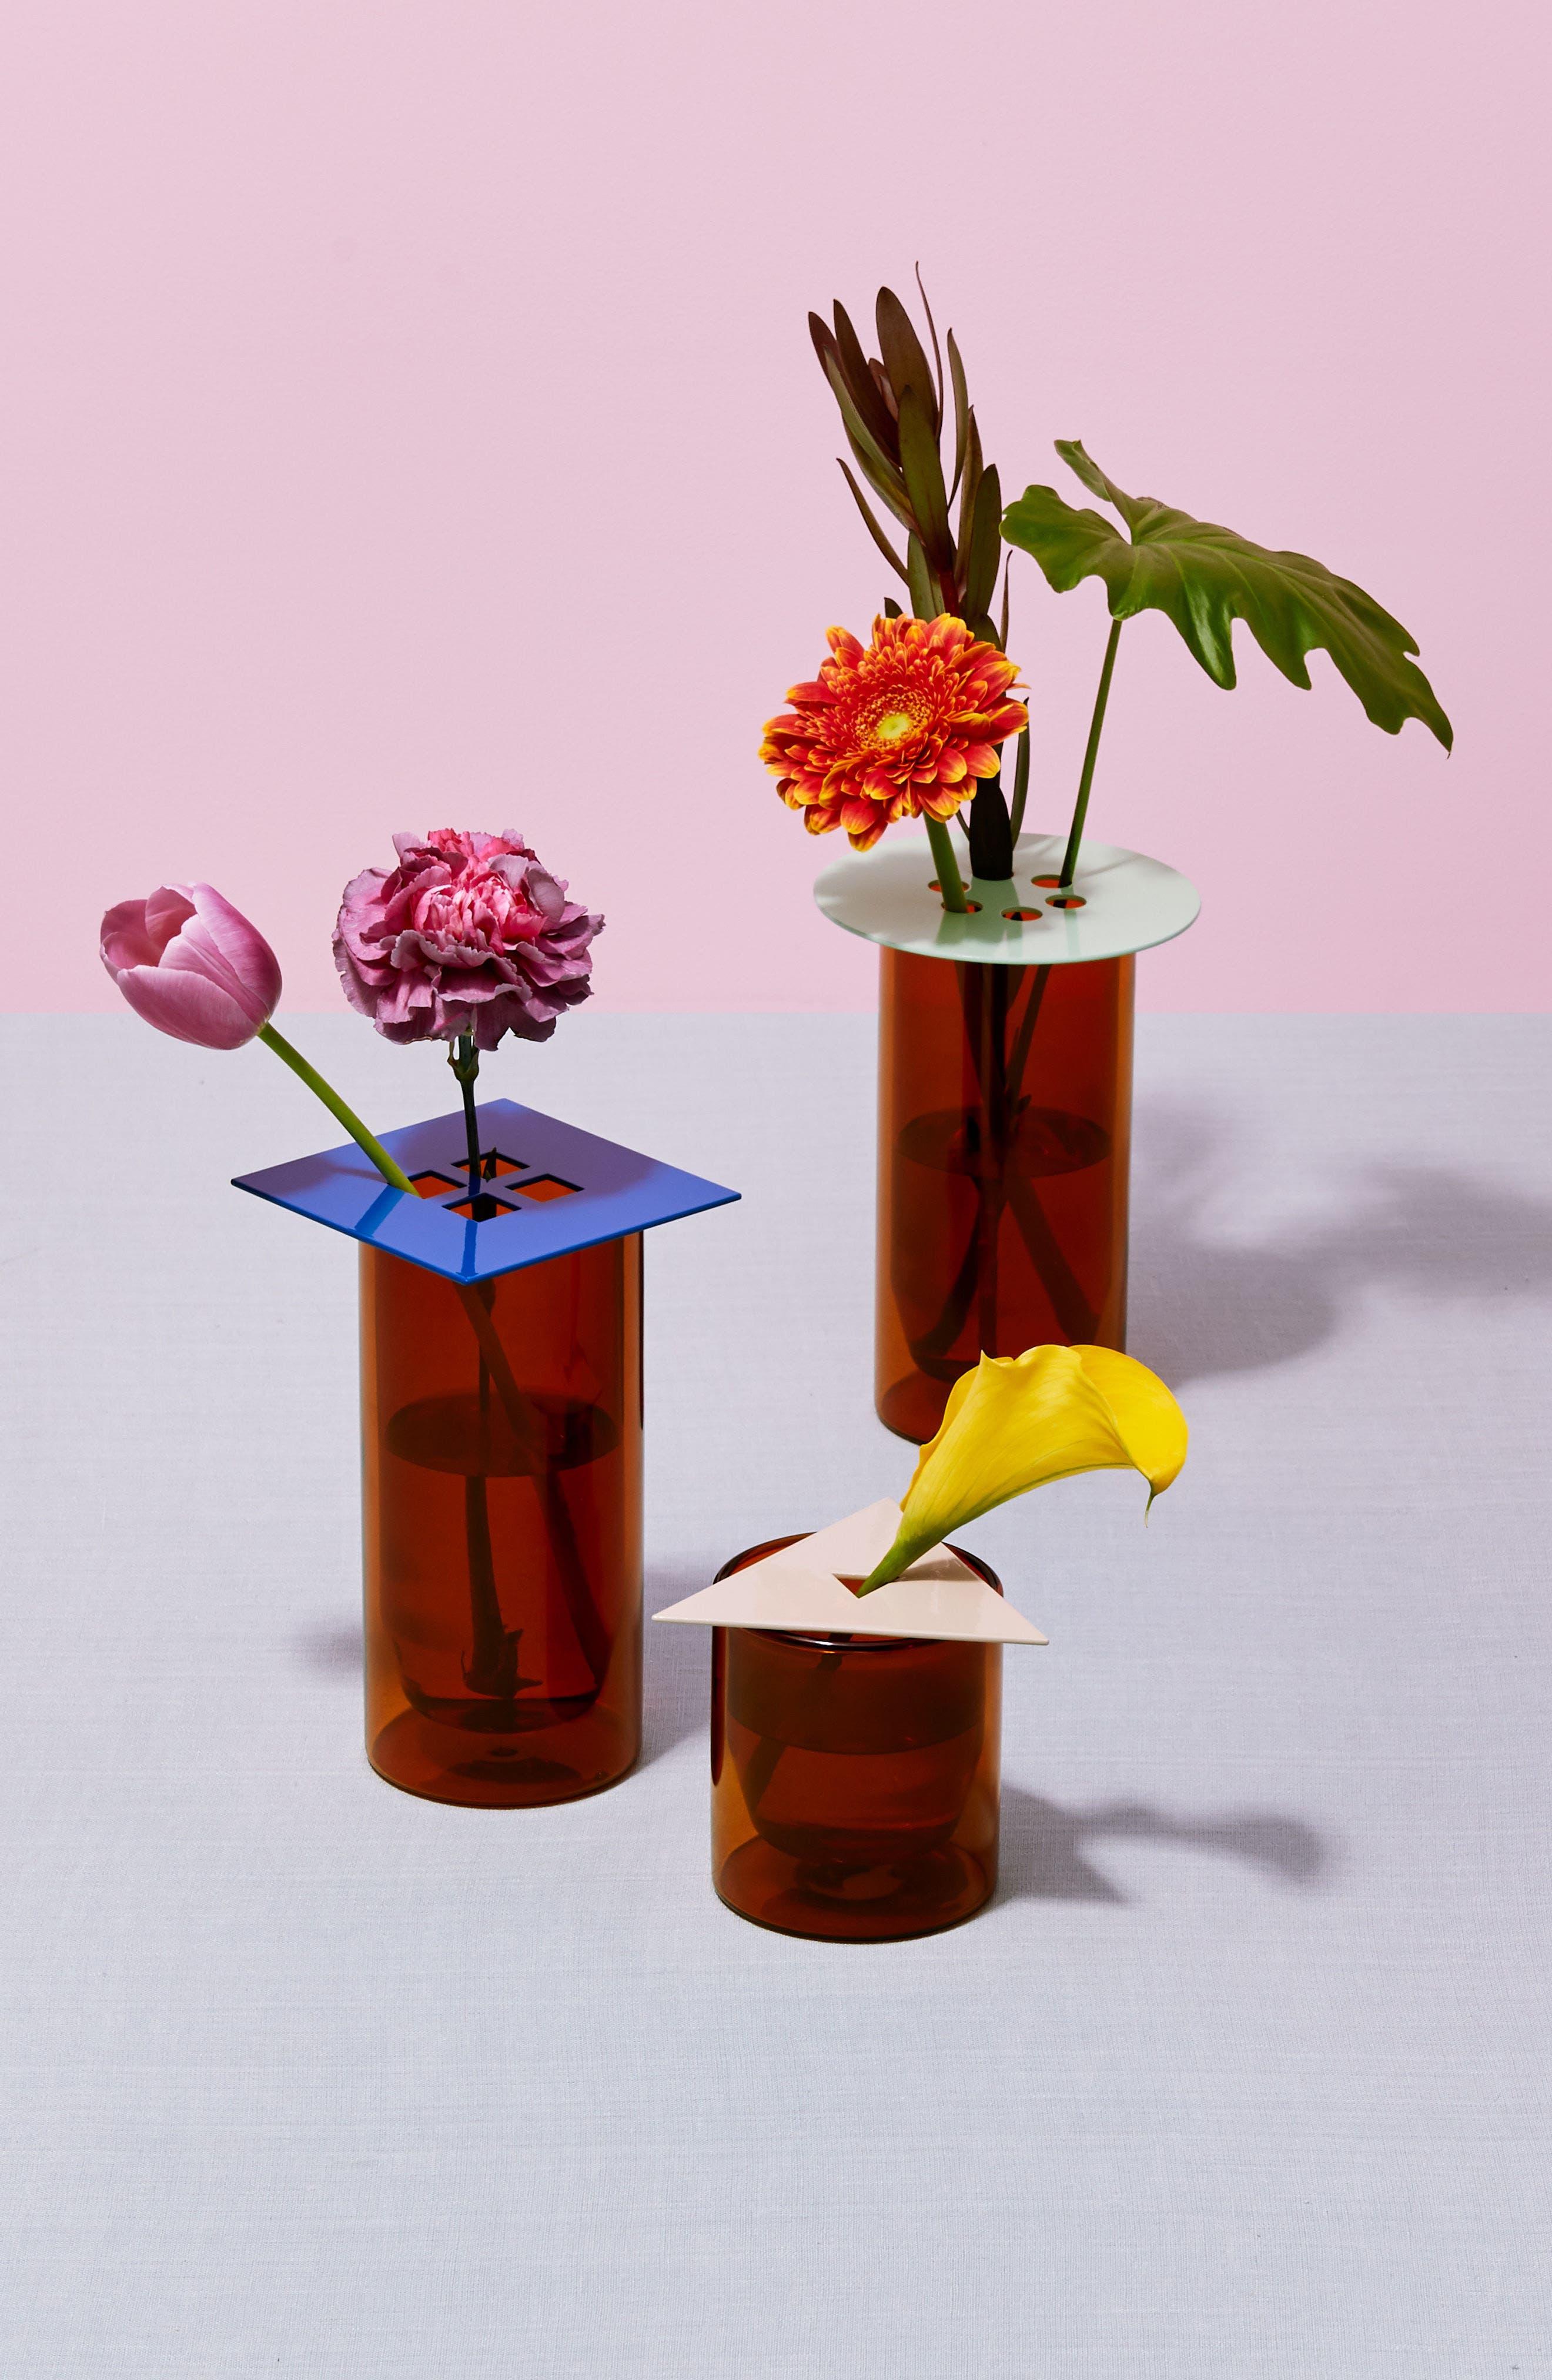 Set of 3 Anywhere Vase Converters,                             Alternate thumbnail 3, color,                             Tan/Mint/Cobal